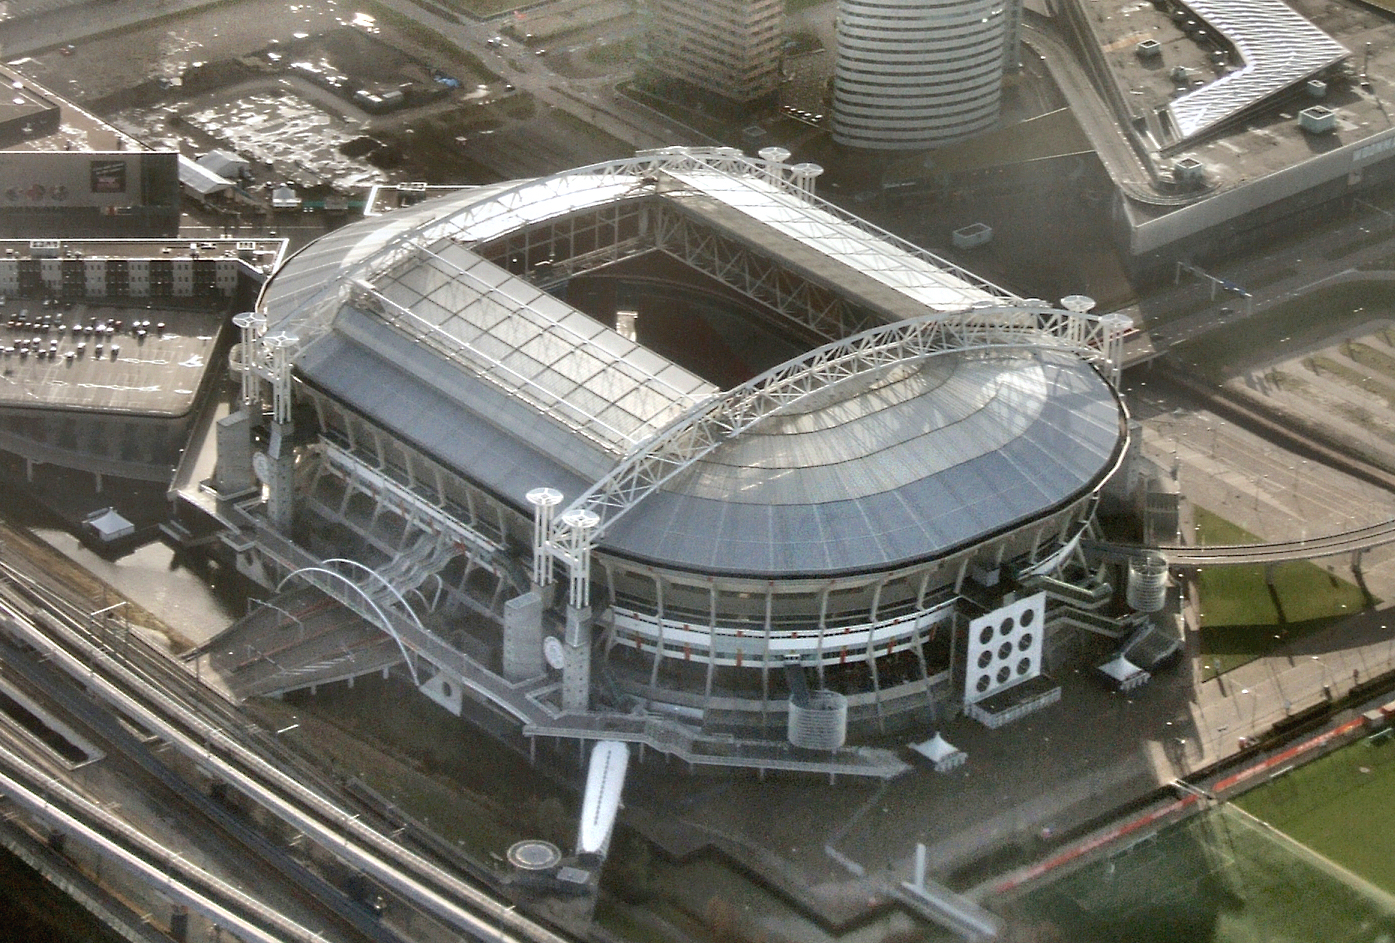 amsterdam_arena_roof_open.jpg